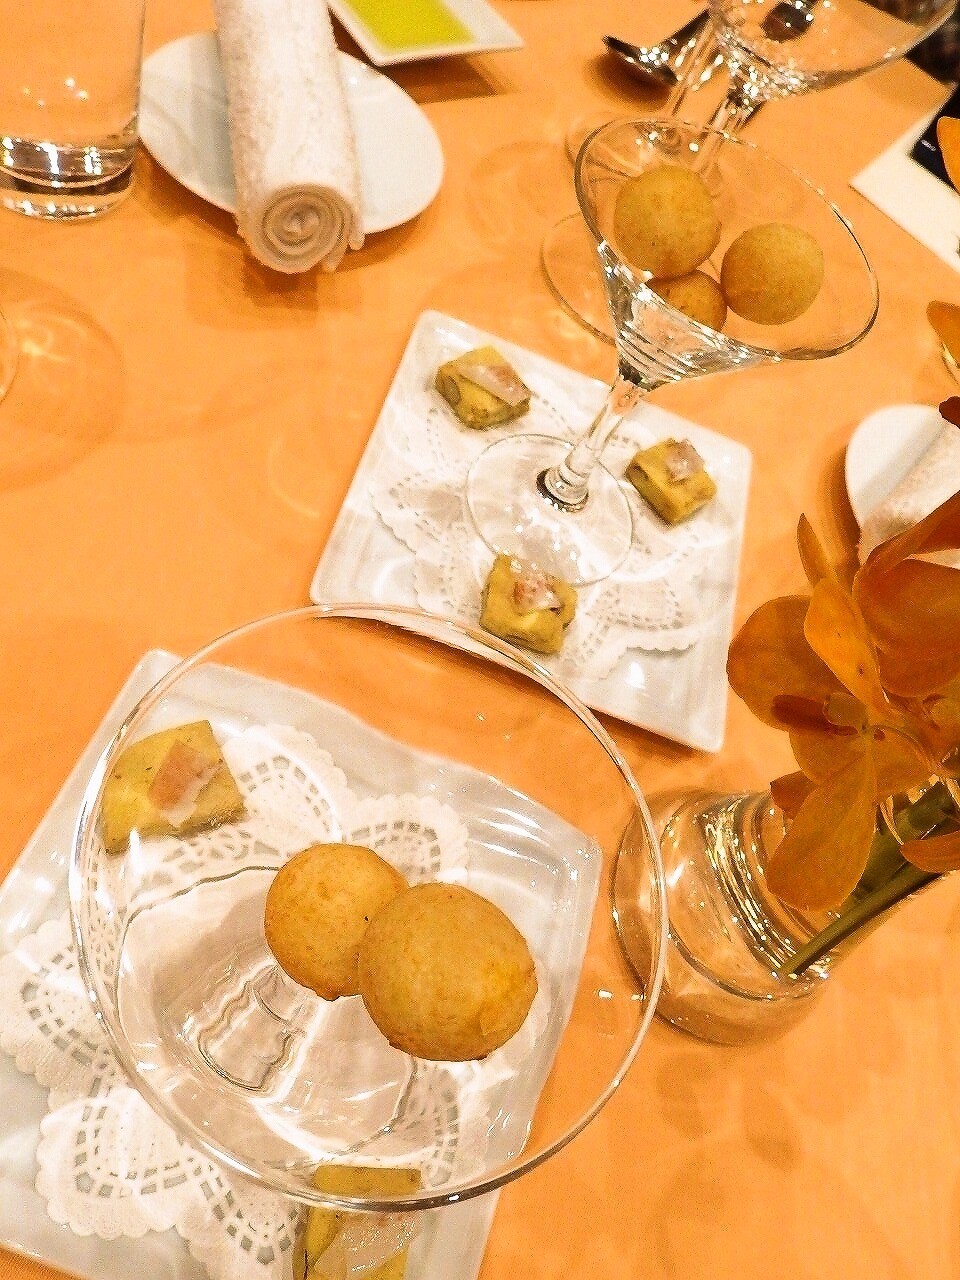 s-foodpic7402267.jpg